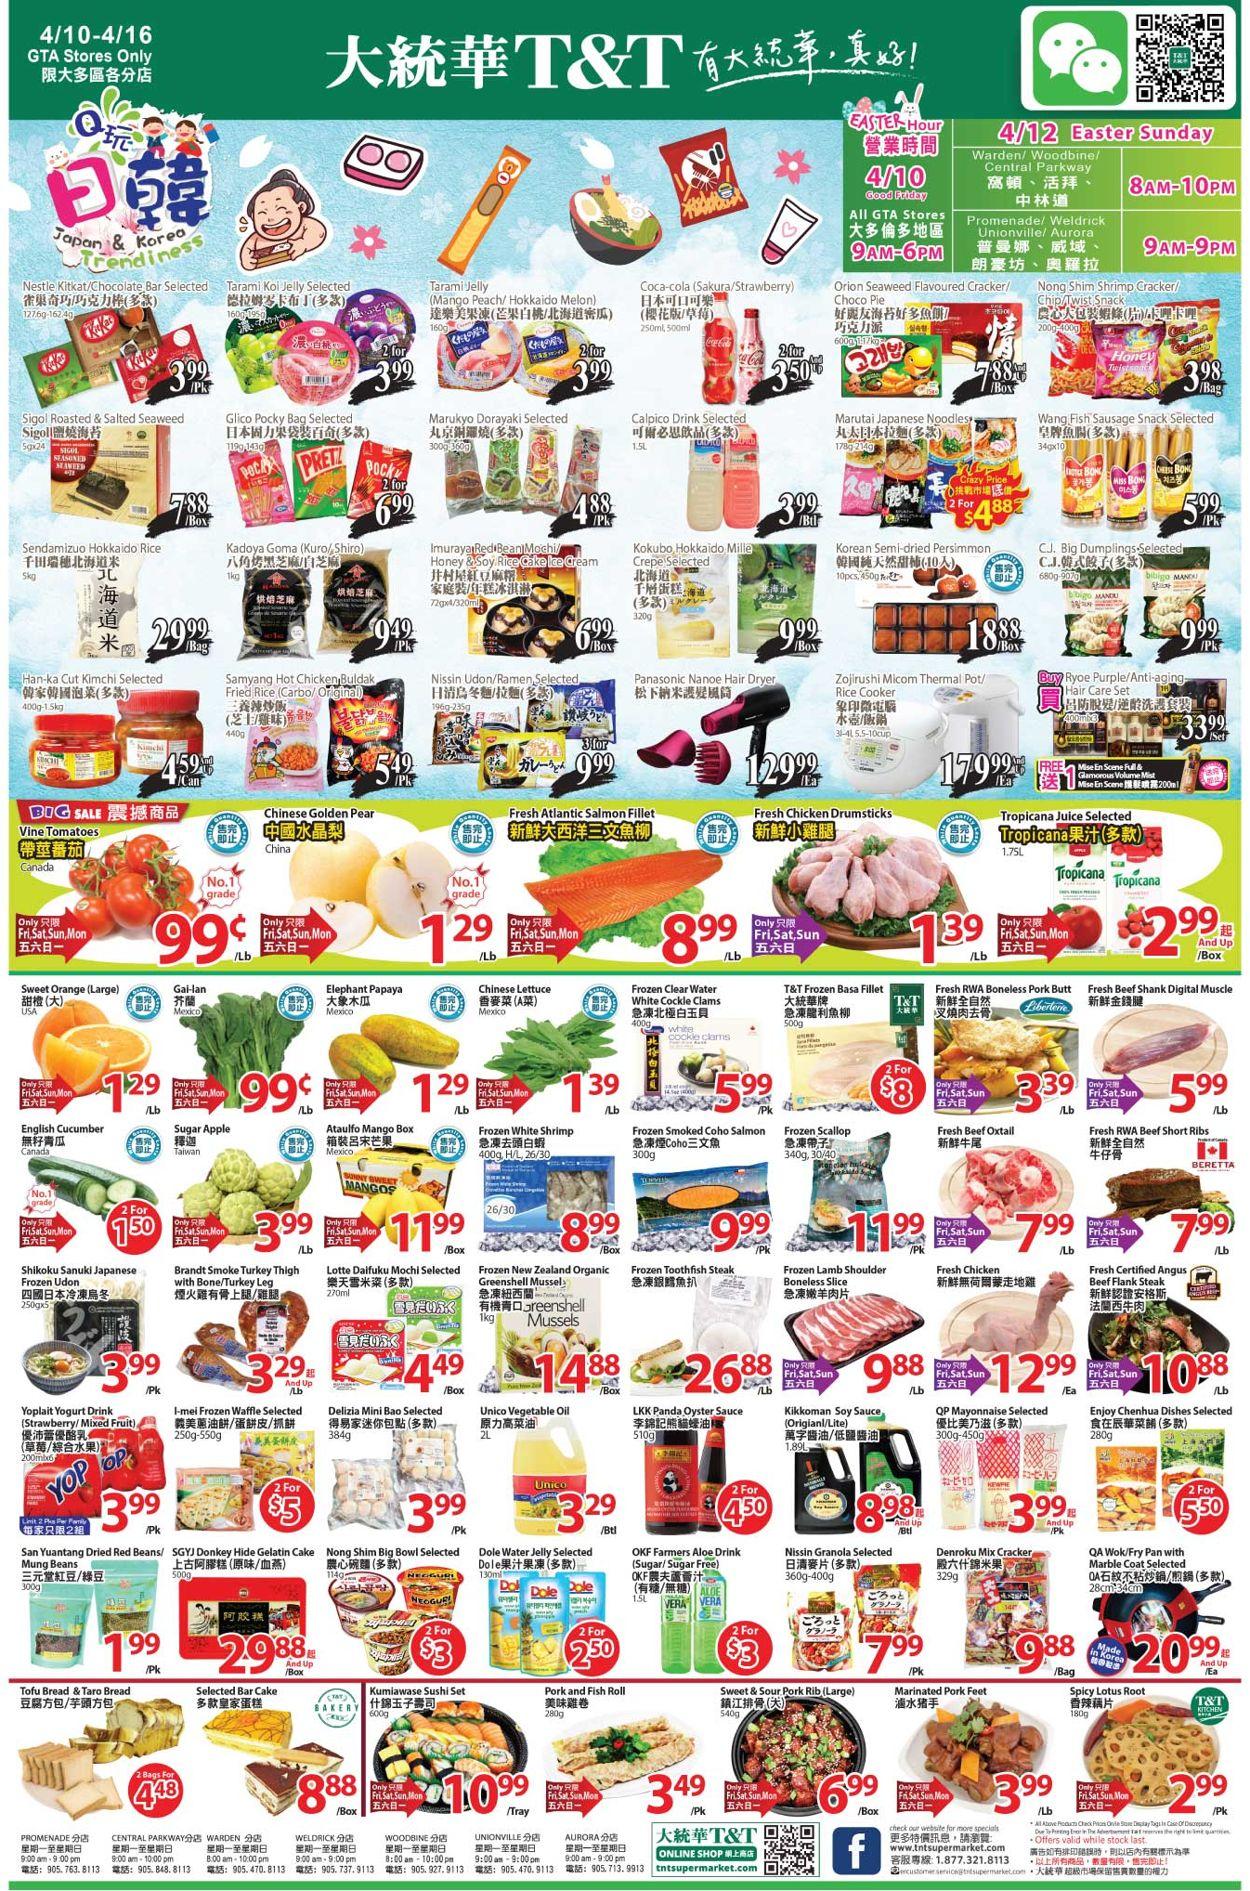 T&T Supermarket Flyer - 04/14-04/16/2020 (Page 2)